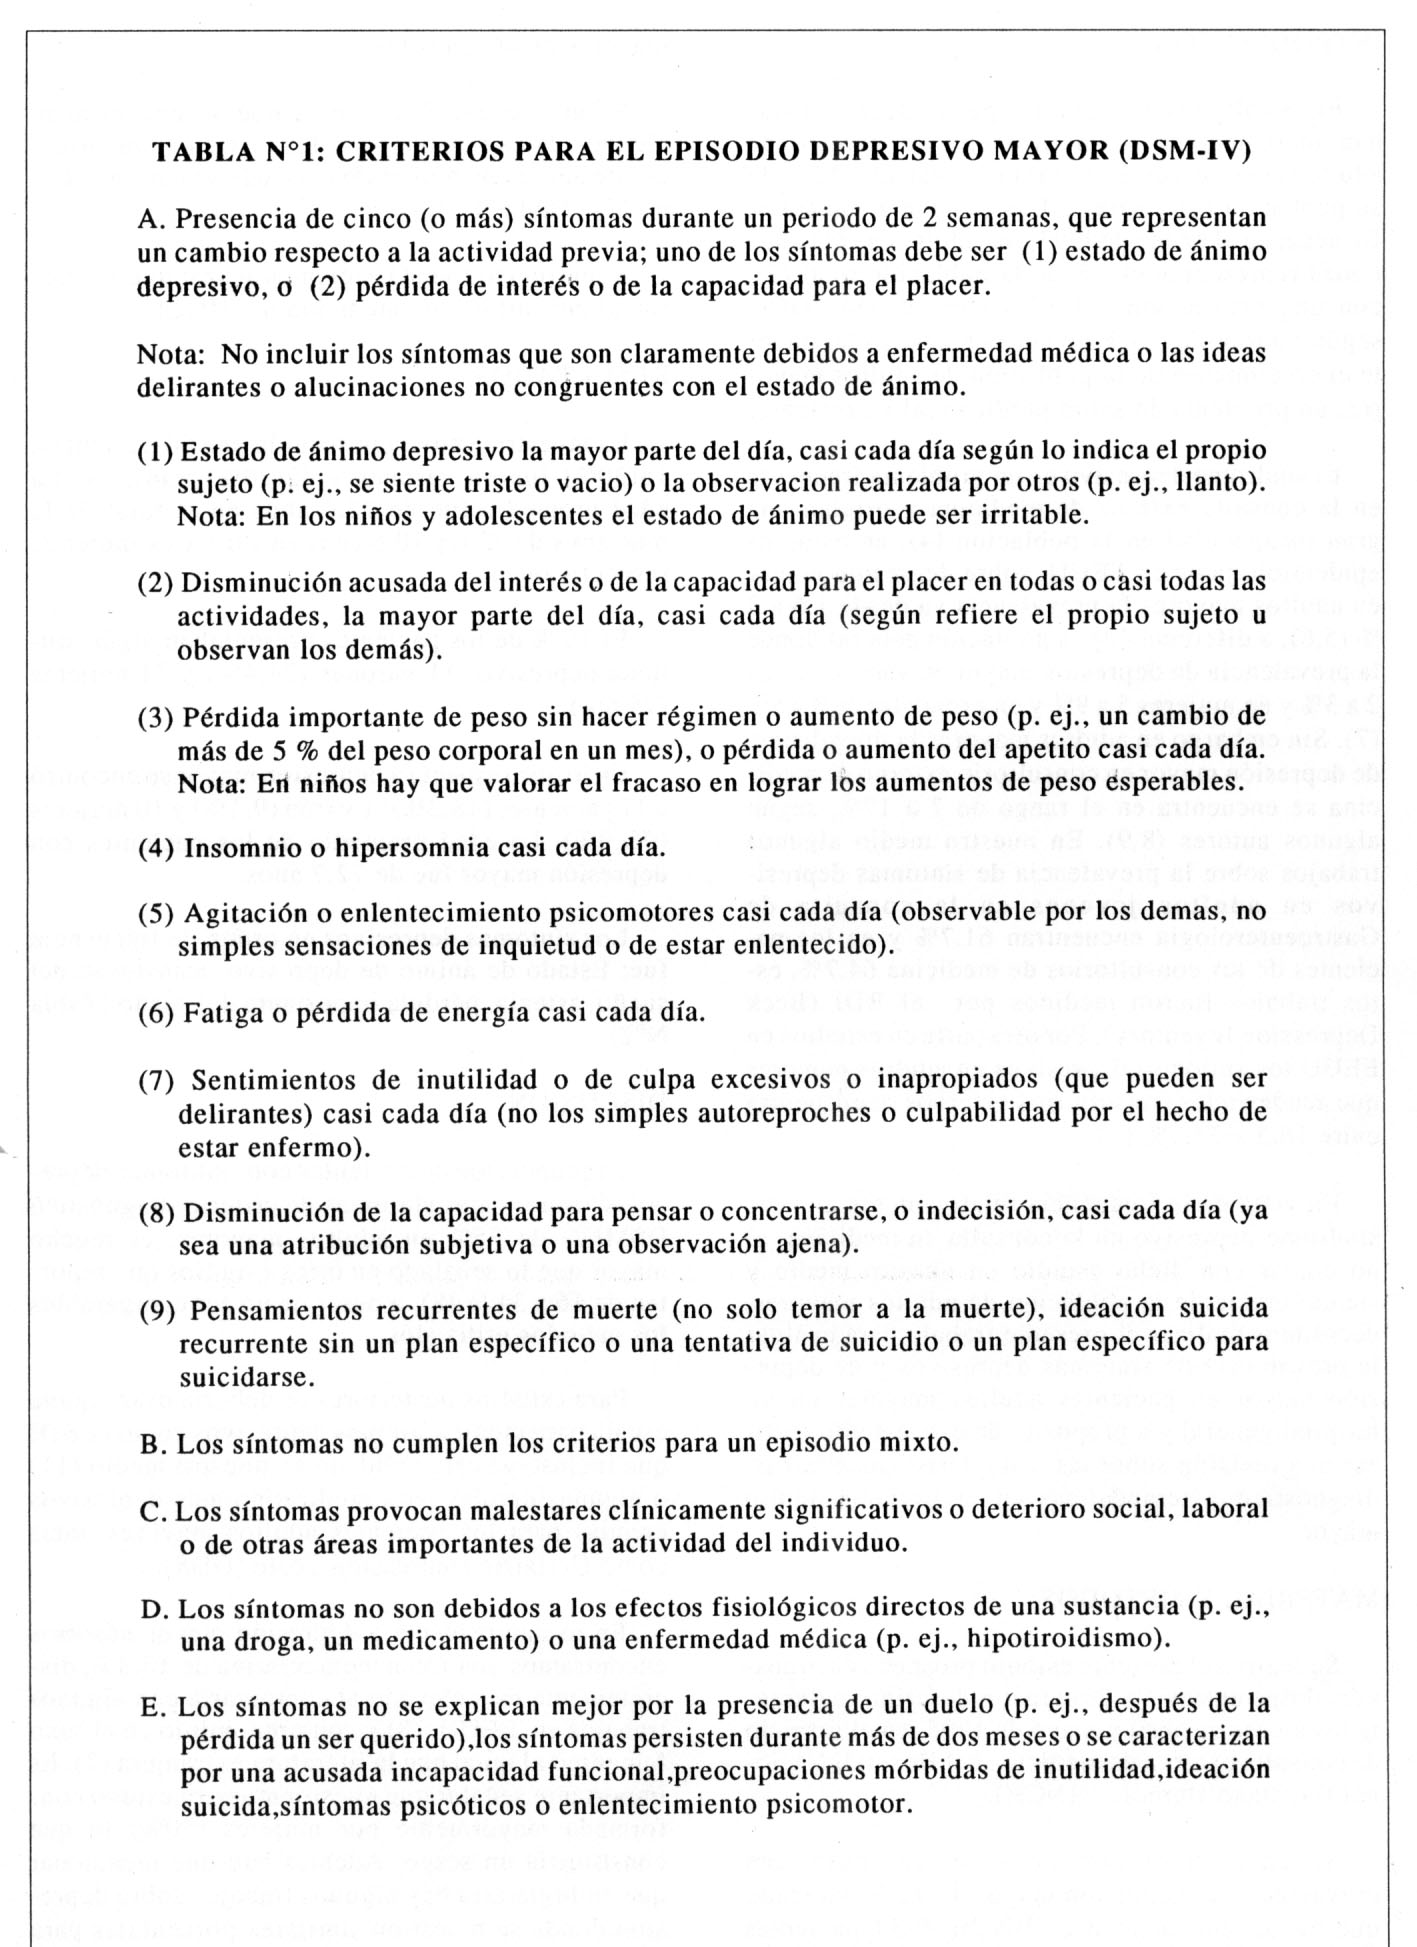 beck depression inventory manual pdf